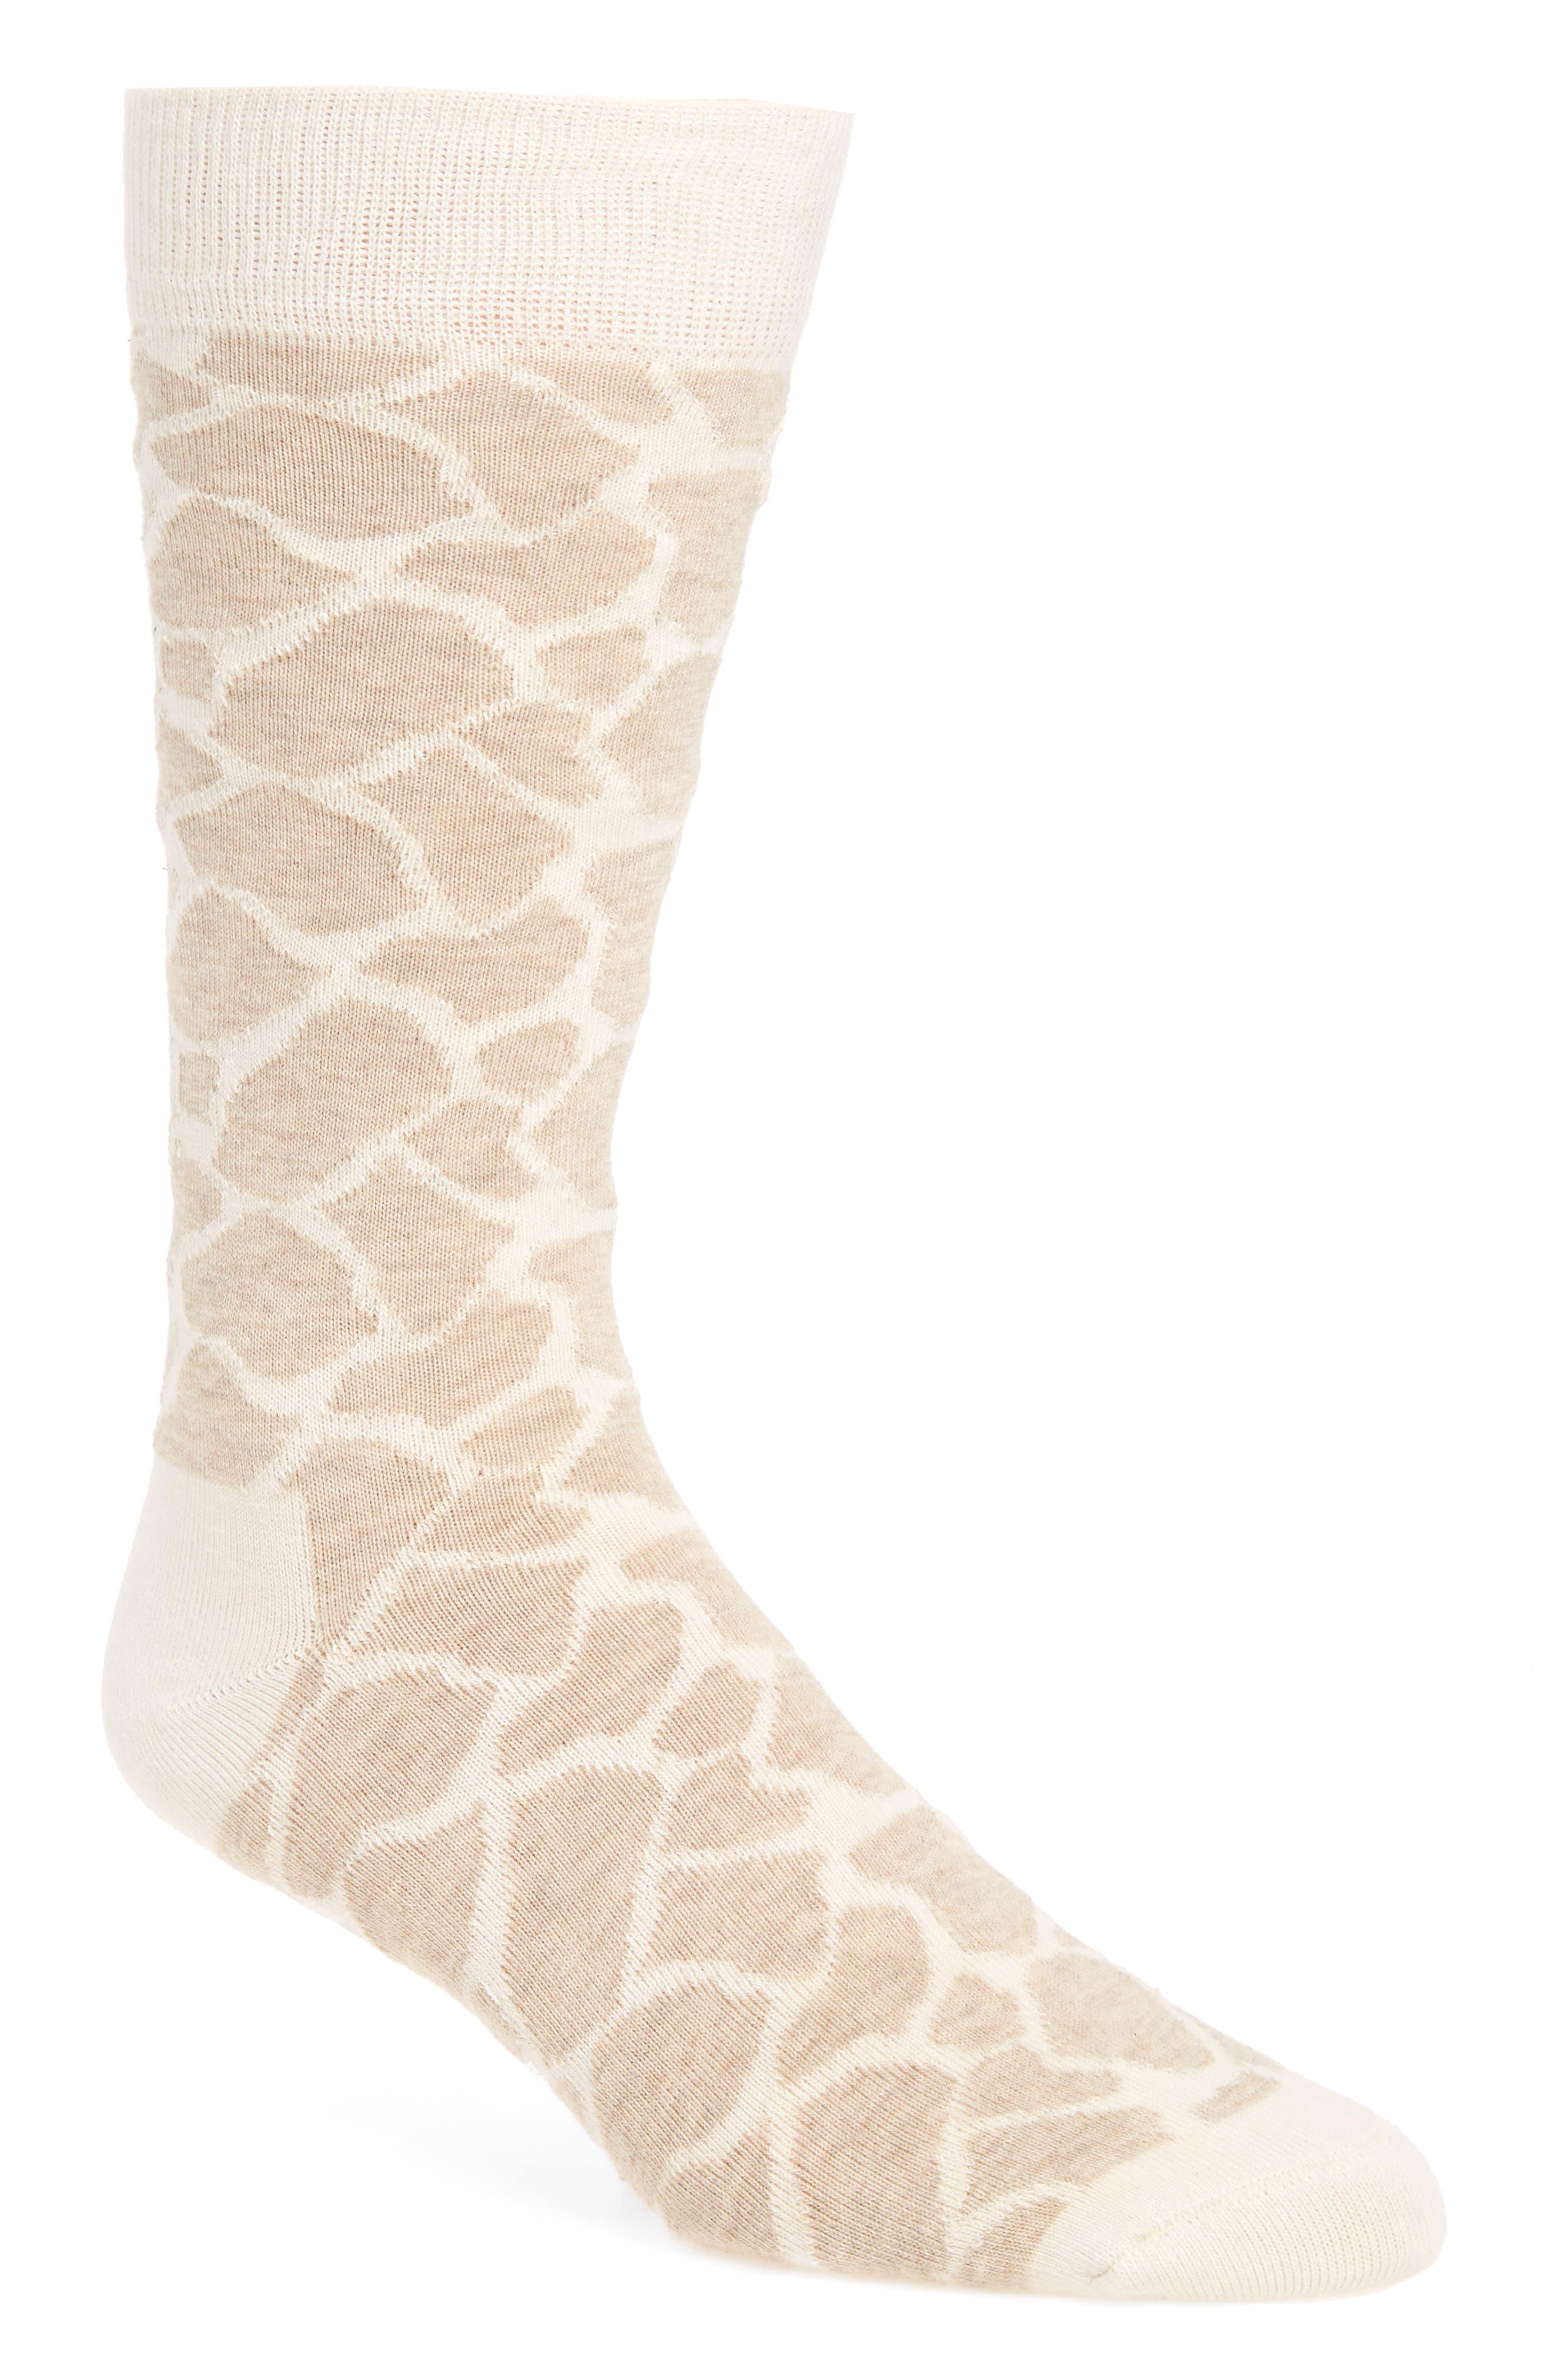 Giraffe Print Socks,                         Main,                         color,